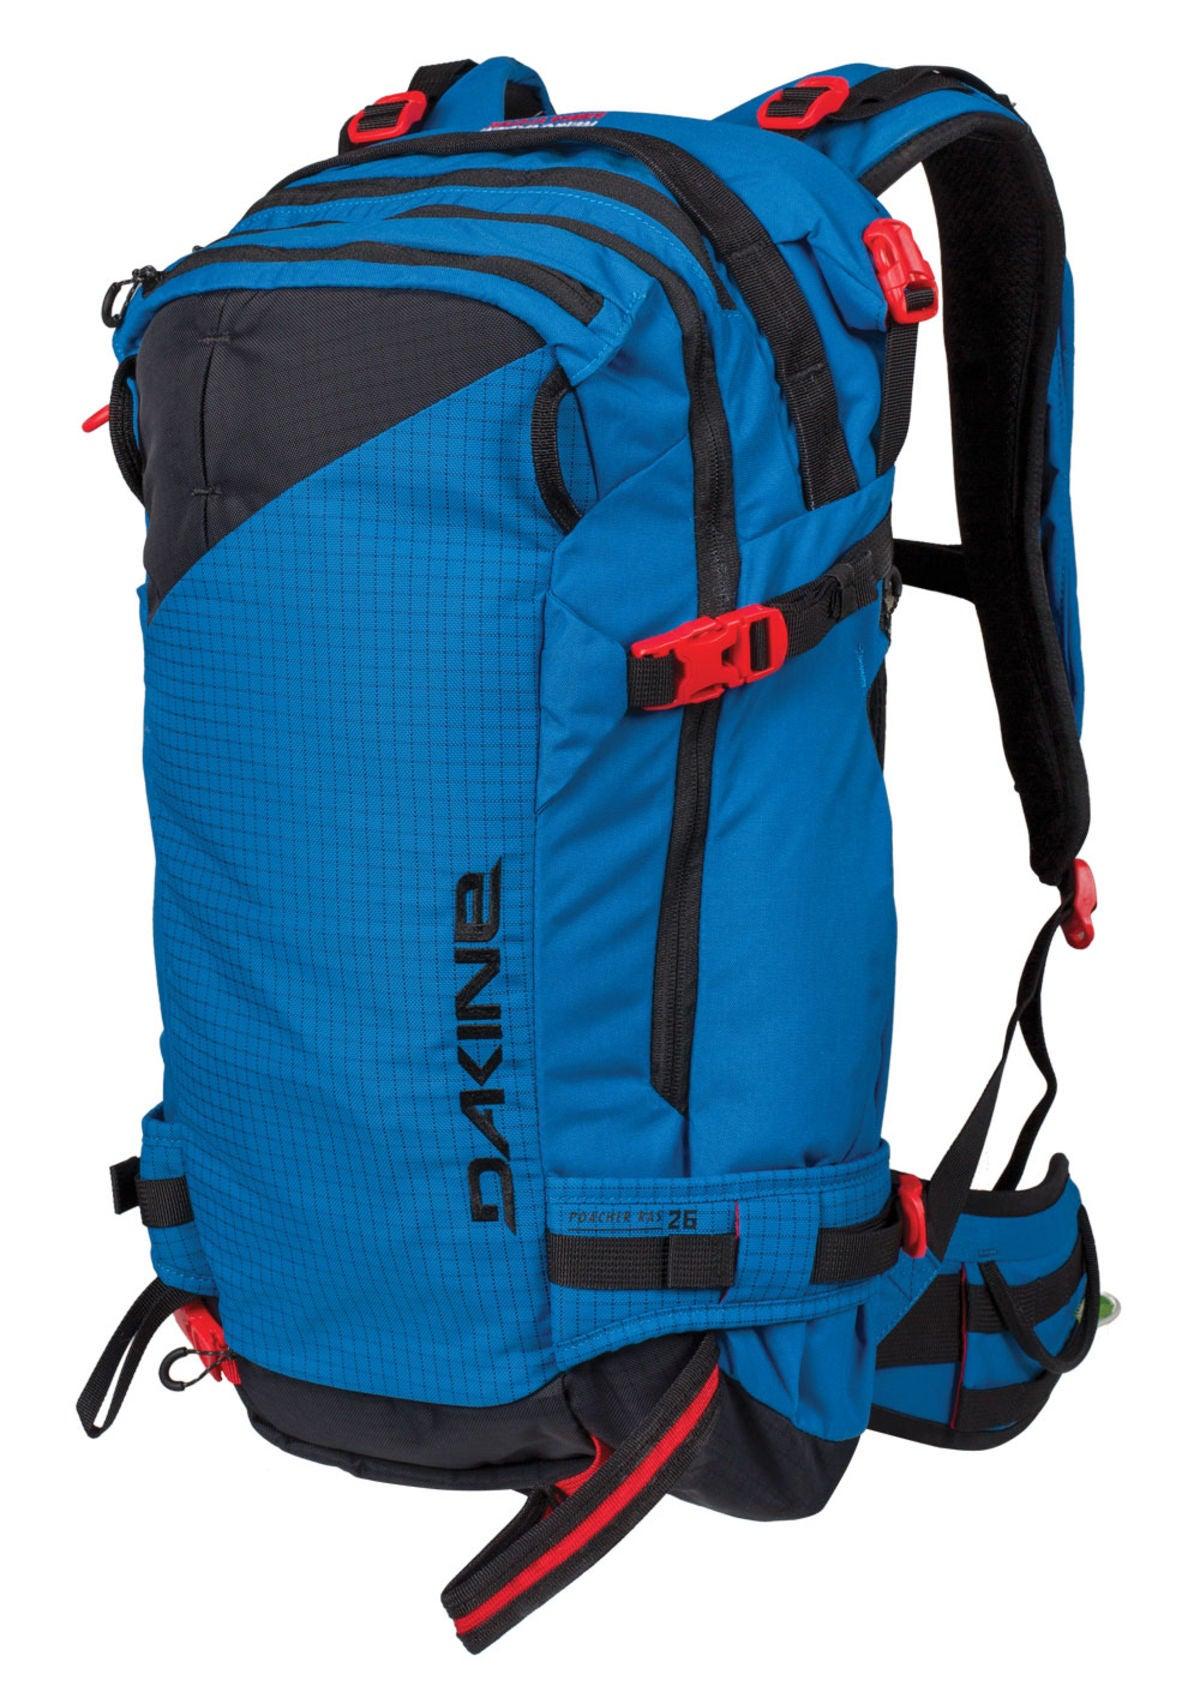 Dakine Poacher RAS 26 Backpack